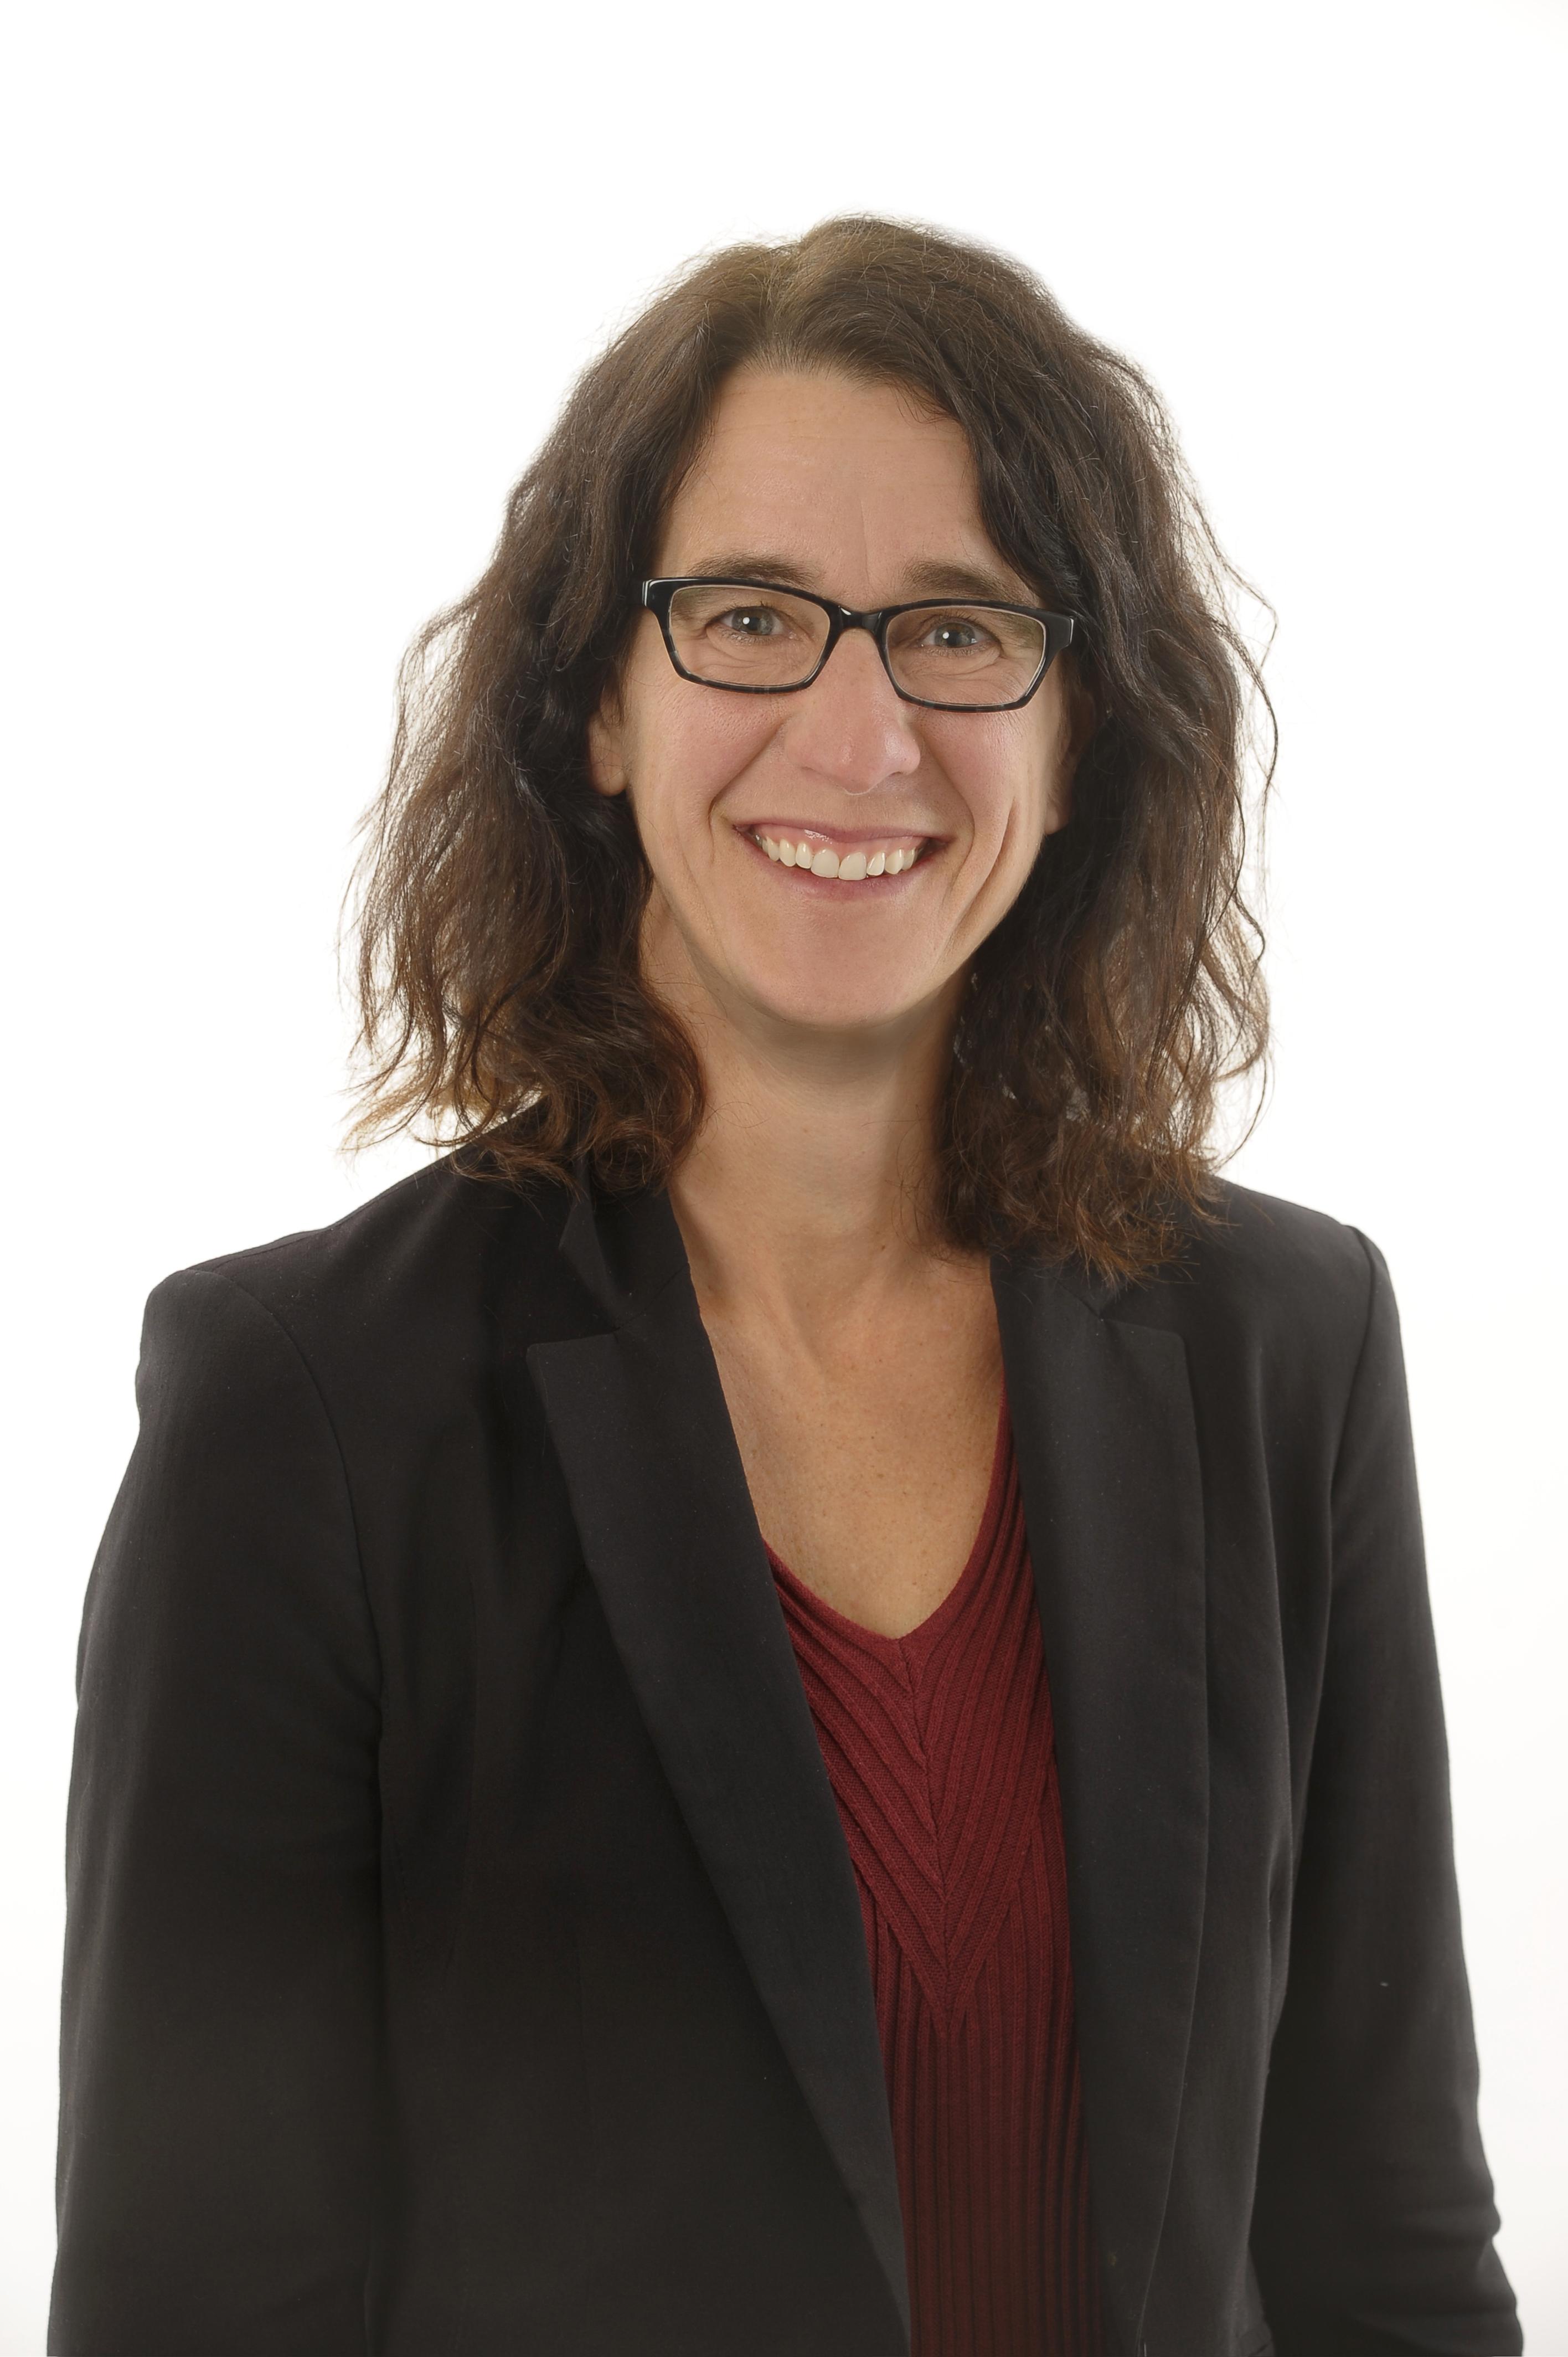 Headshot of Dr. Lori Chambers senior scientist